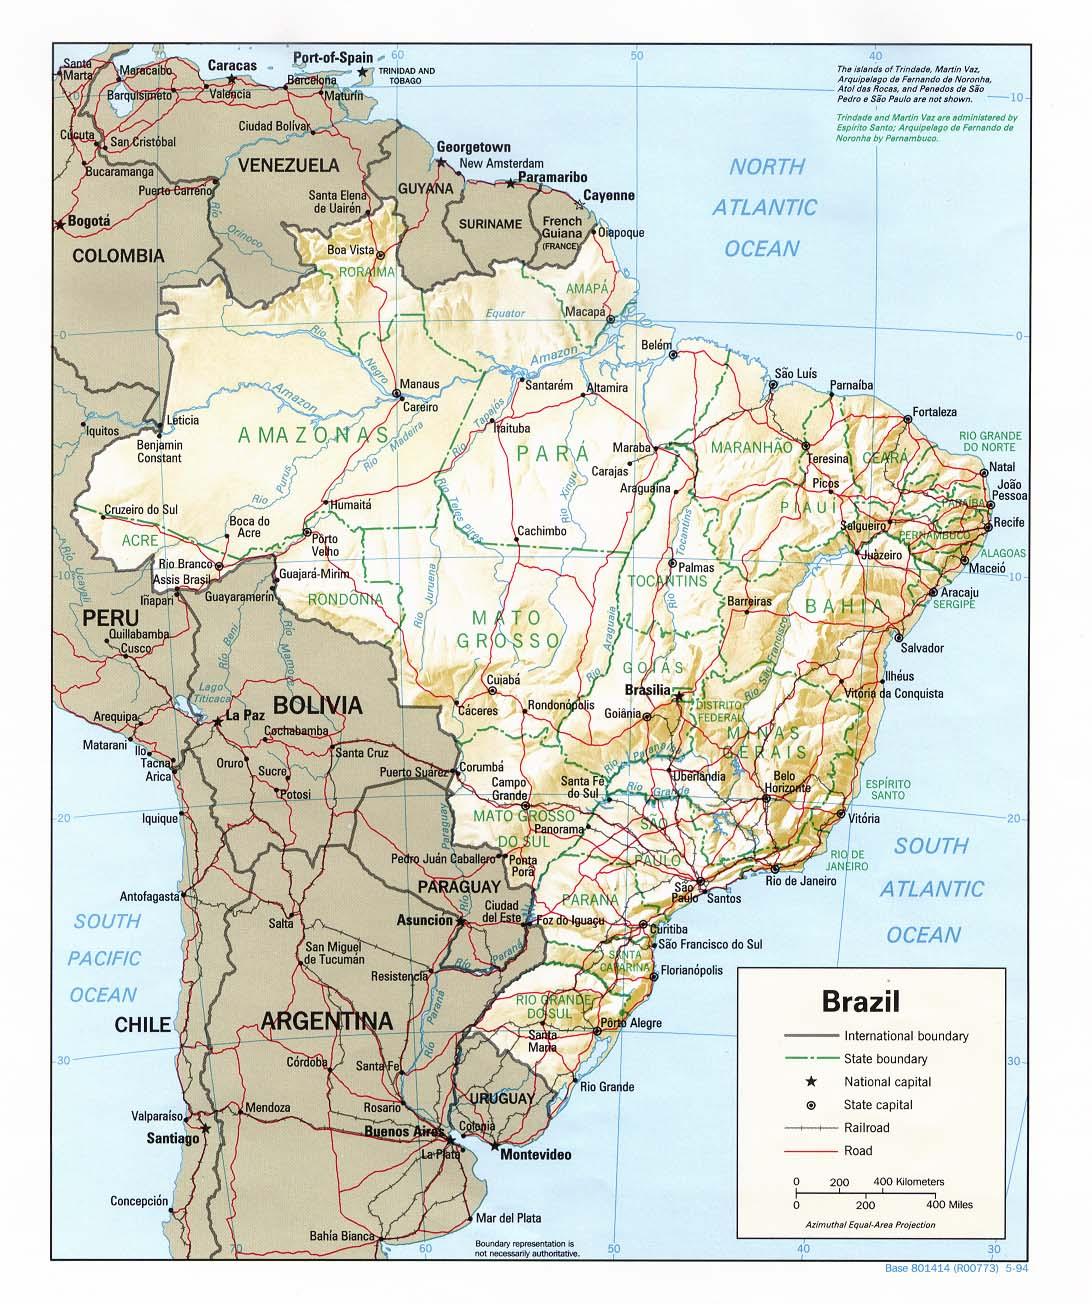 Carte Bresil Relief.Bresil Relief Carte Populationdata Net